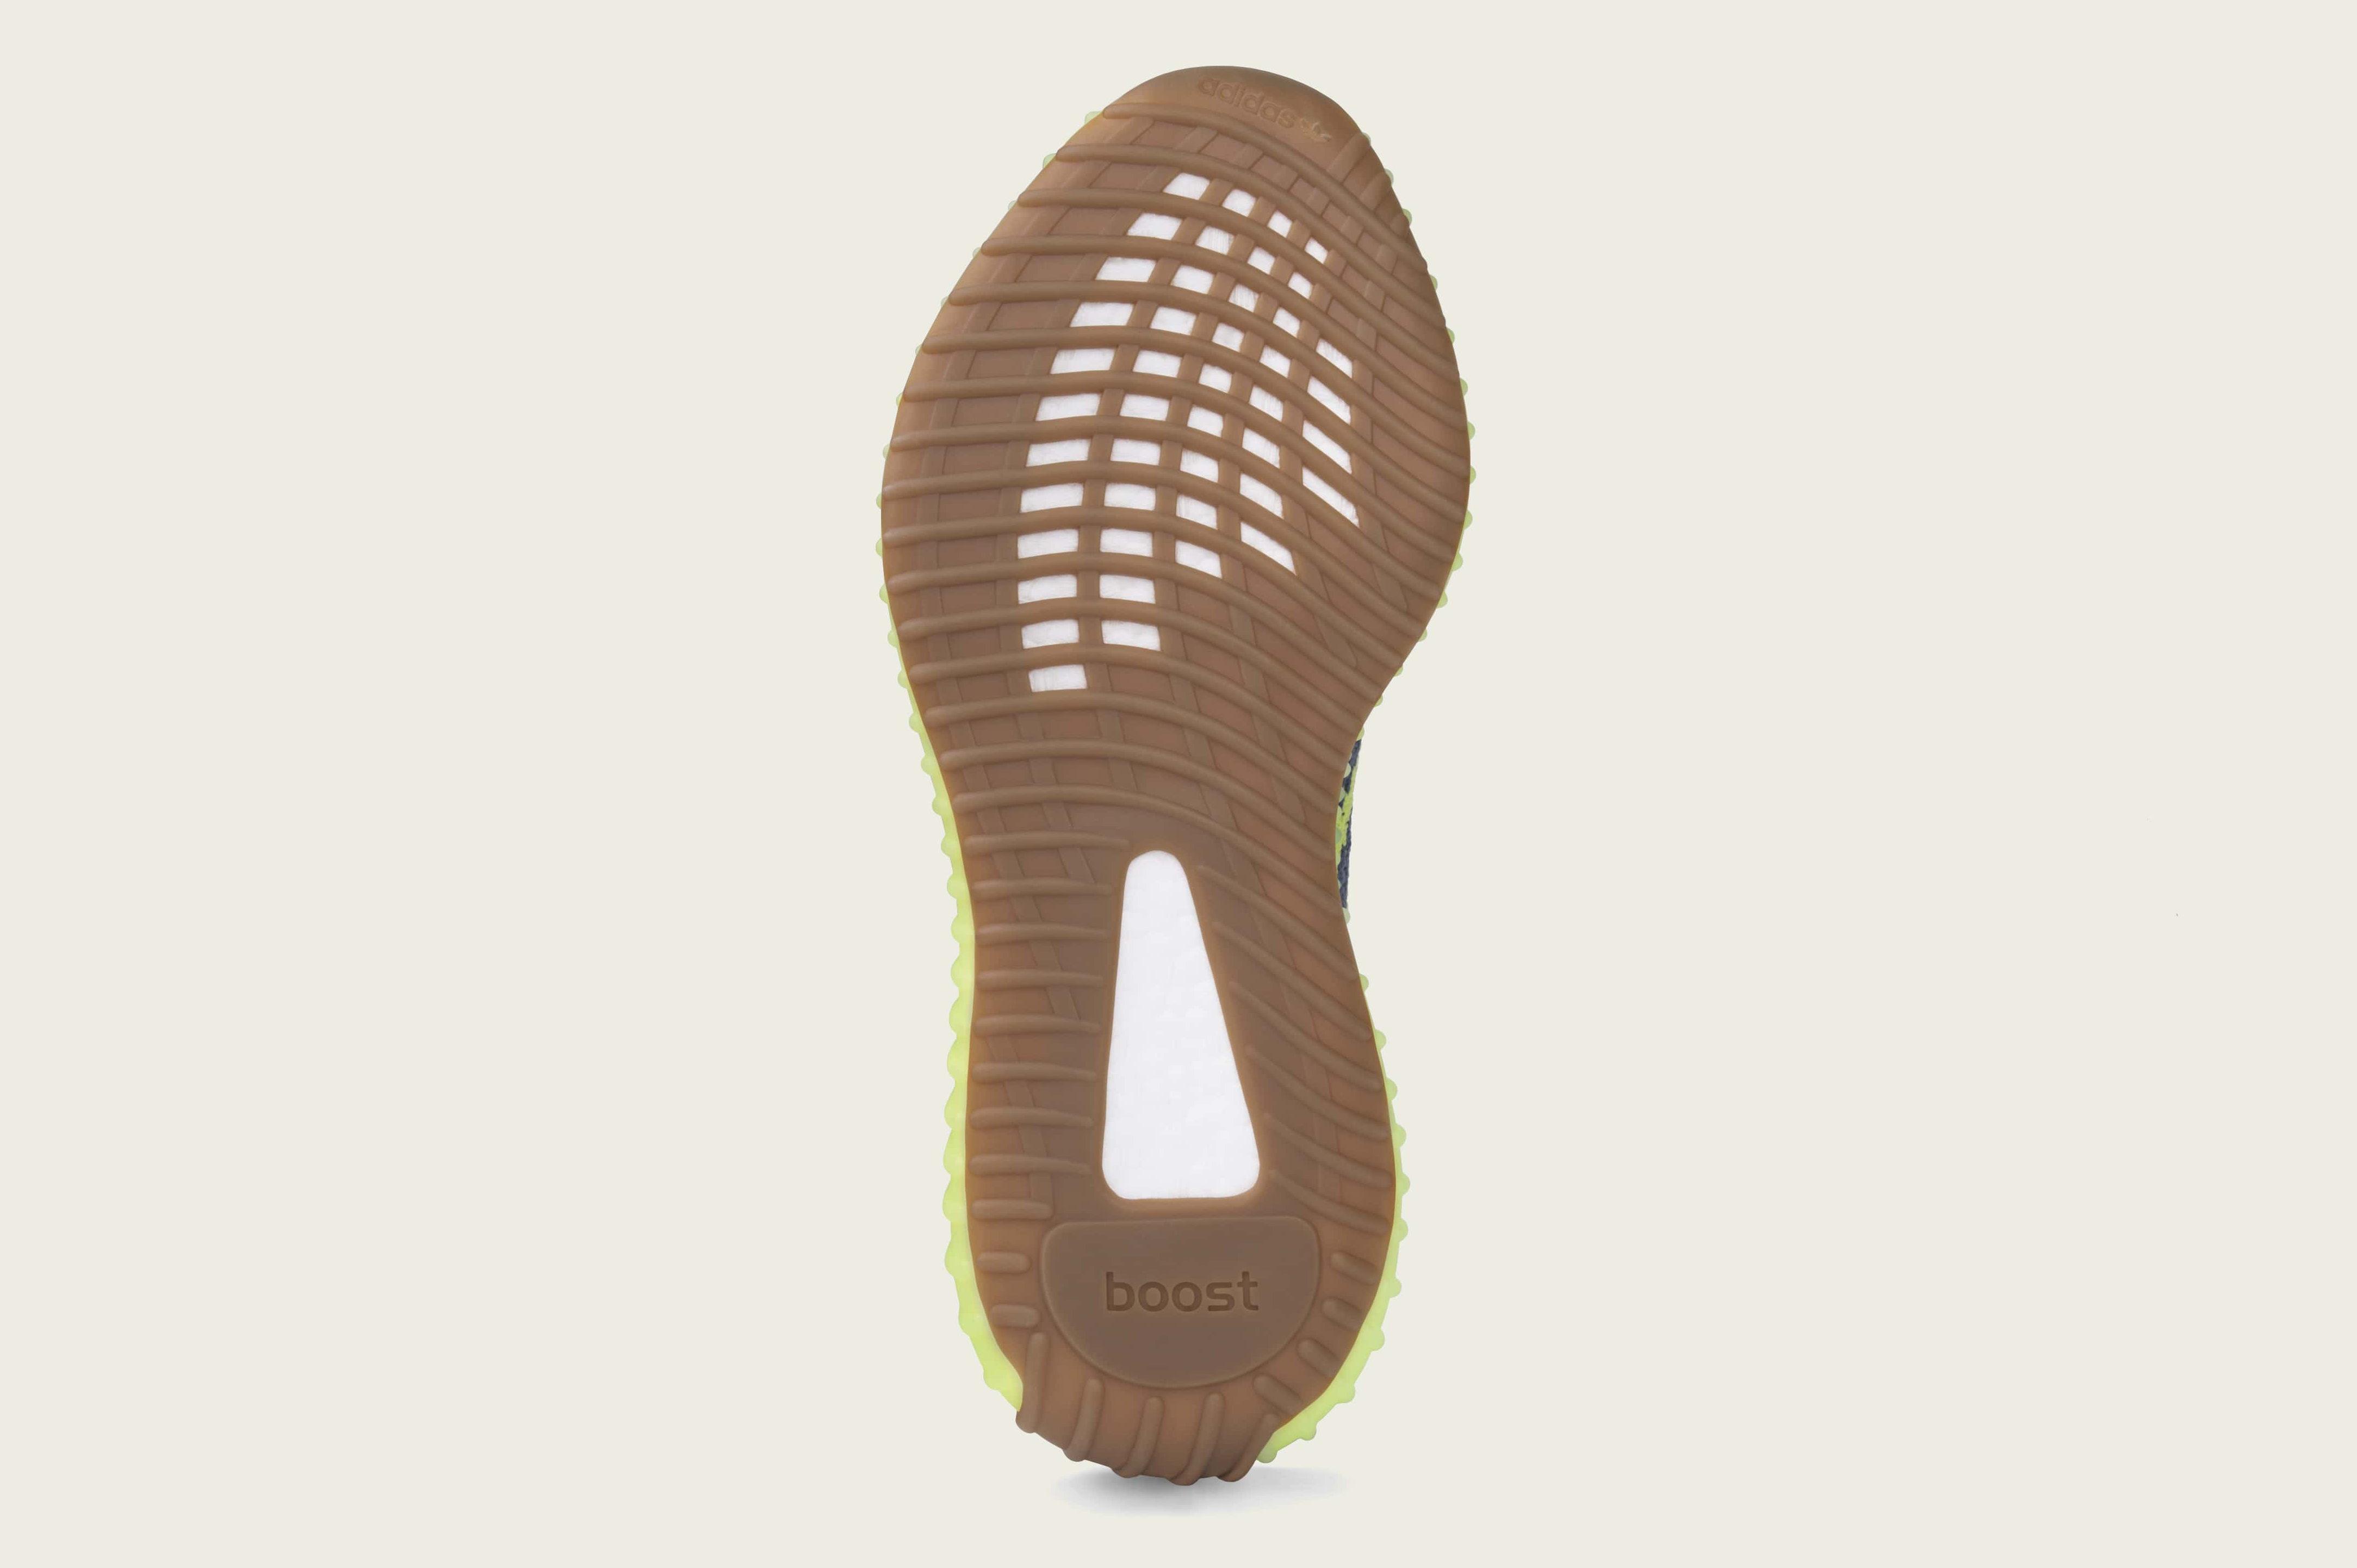 Adidas Yeezy Boost 350 V2 'Semi Frozen Yellow' B37572 (Bottom)